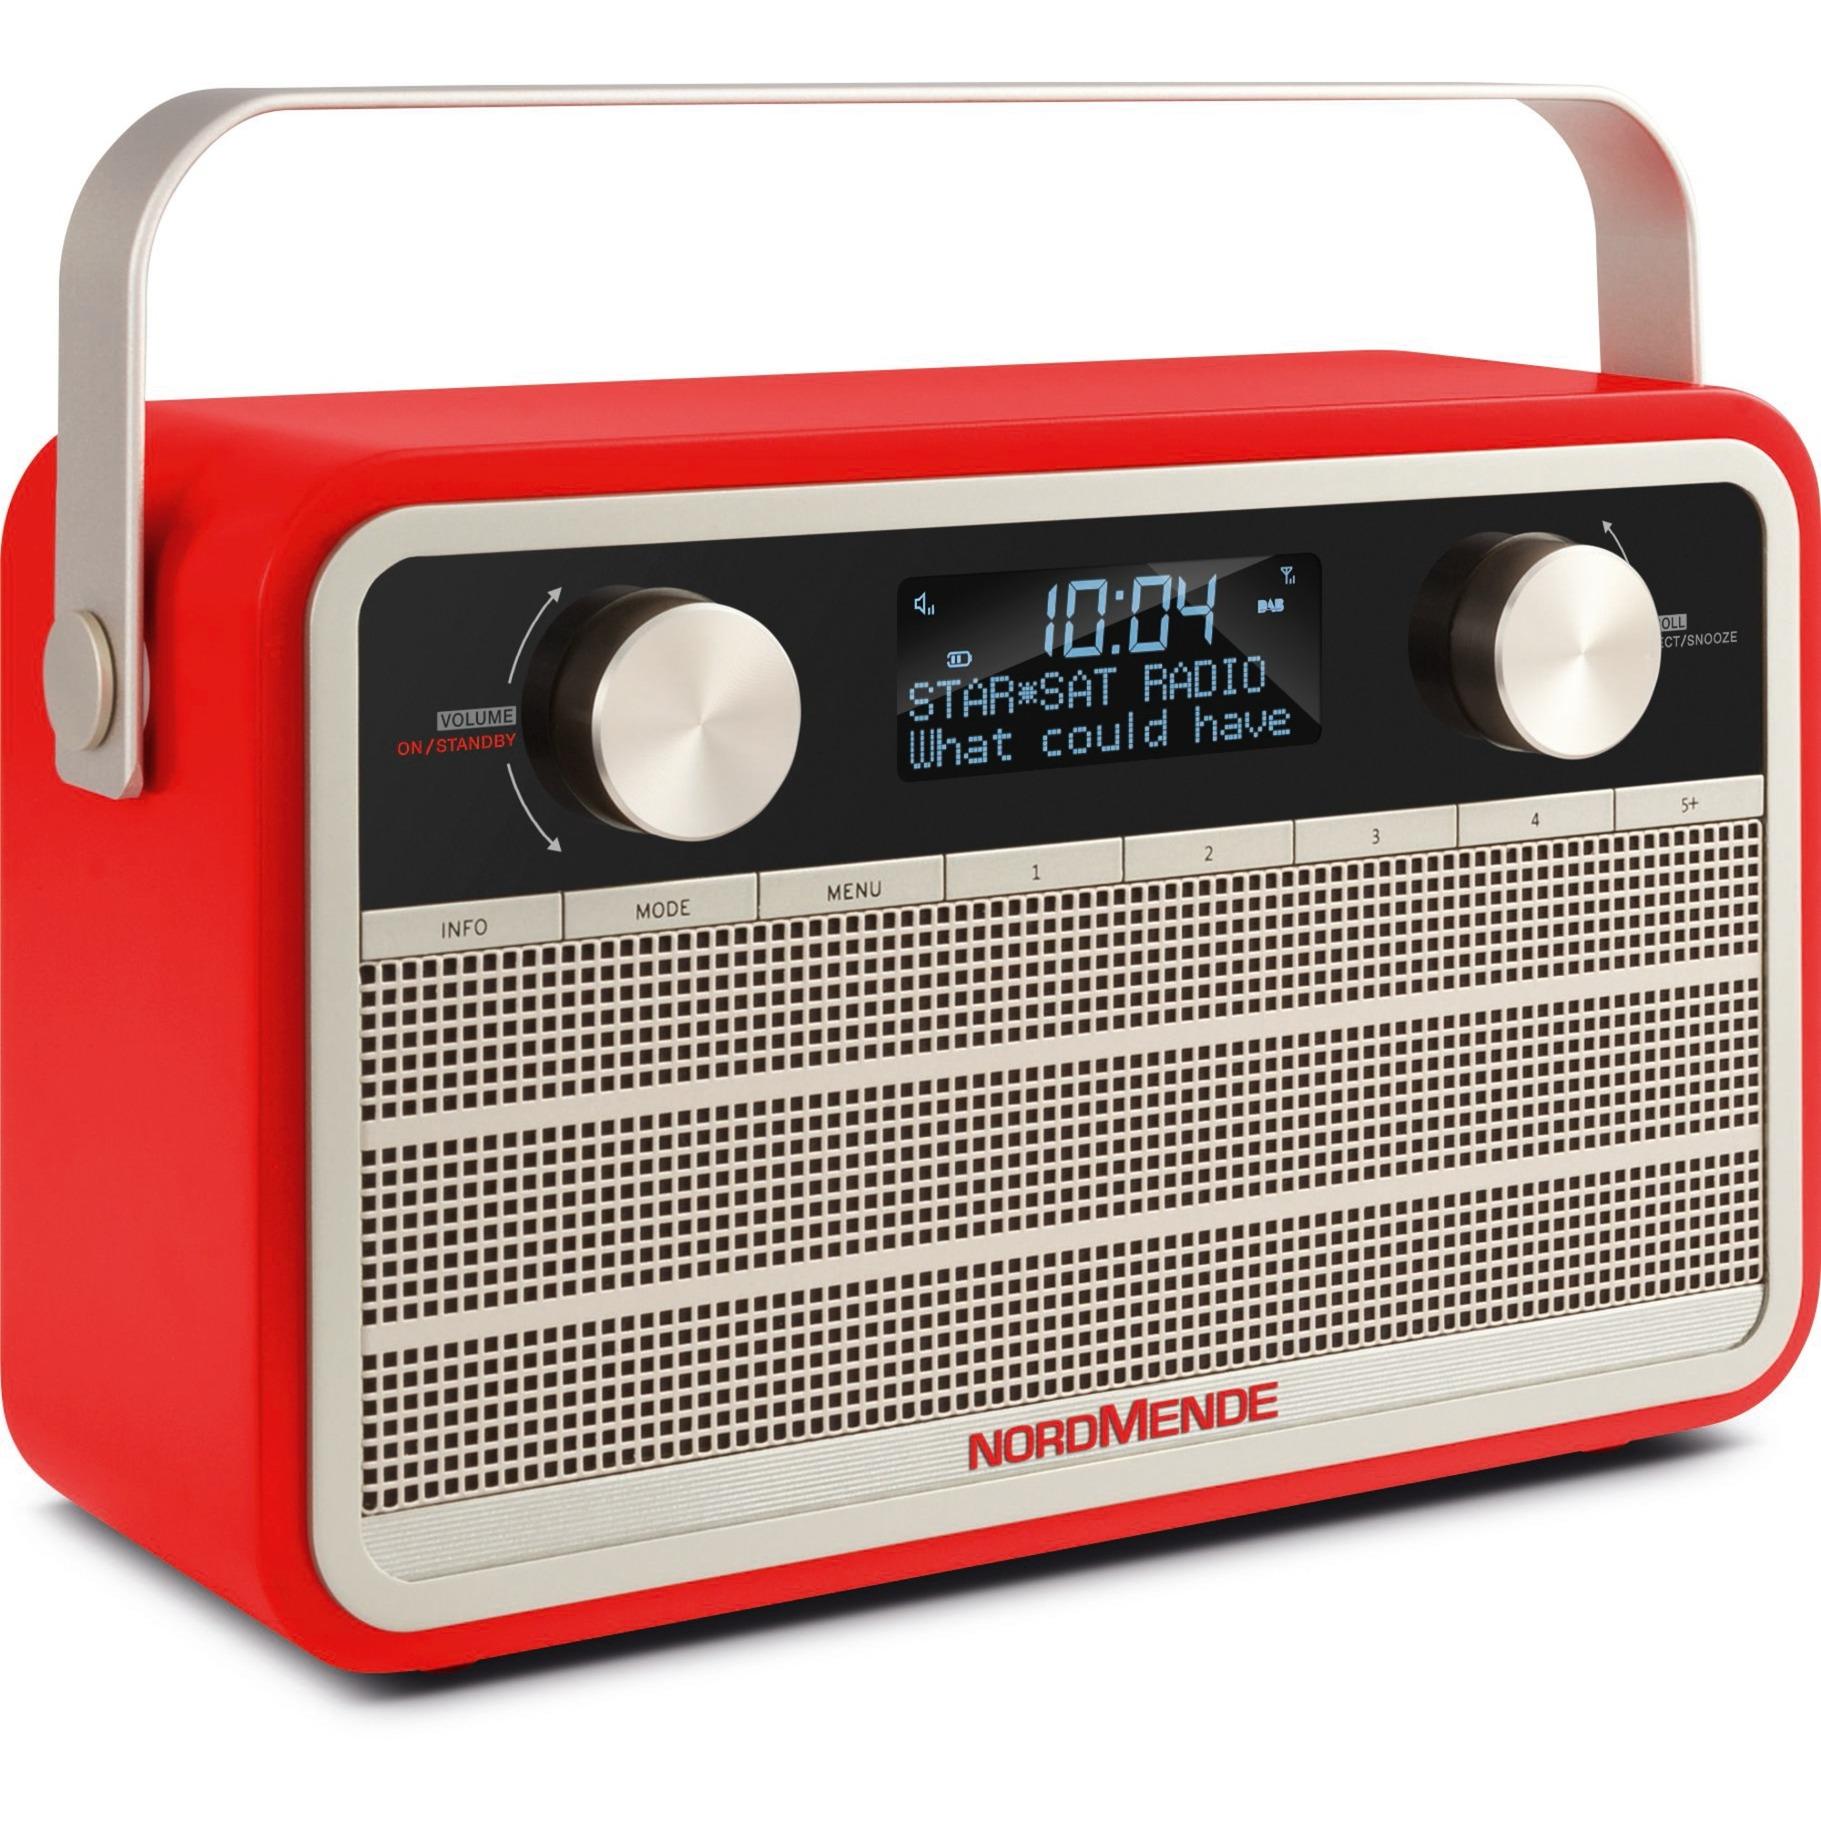 Transita 120 radio Portátil Digital Beige, Rojo